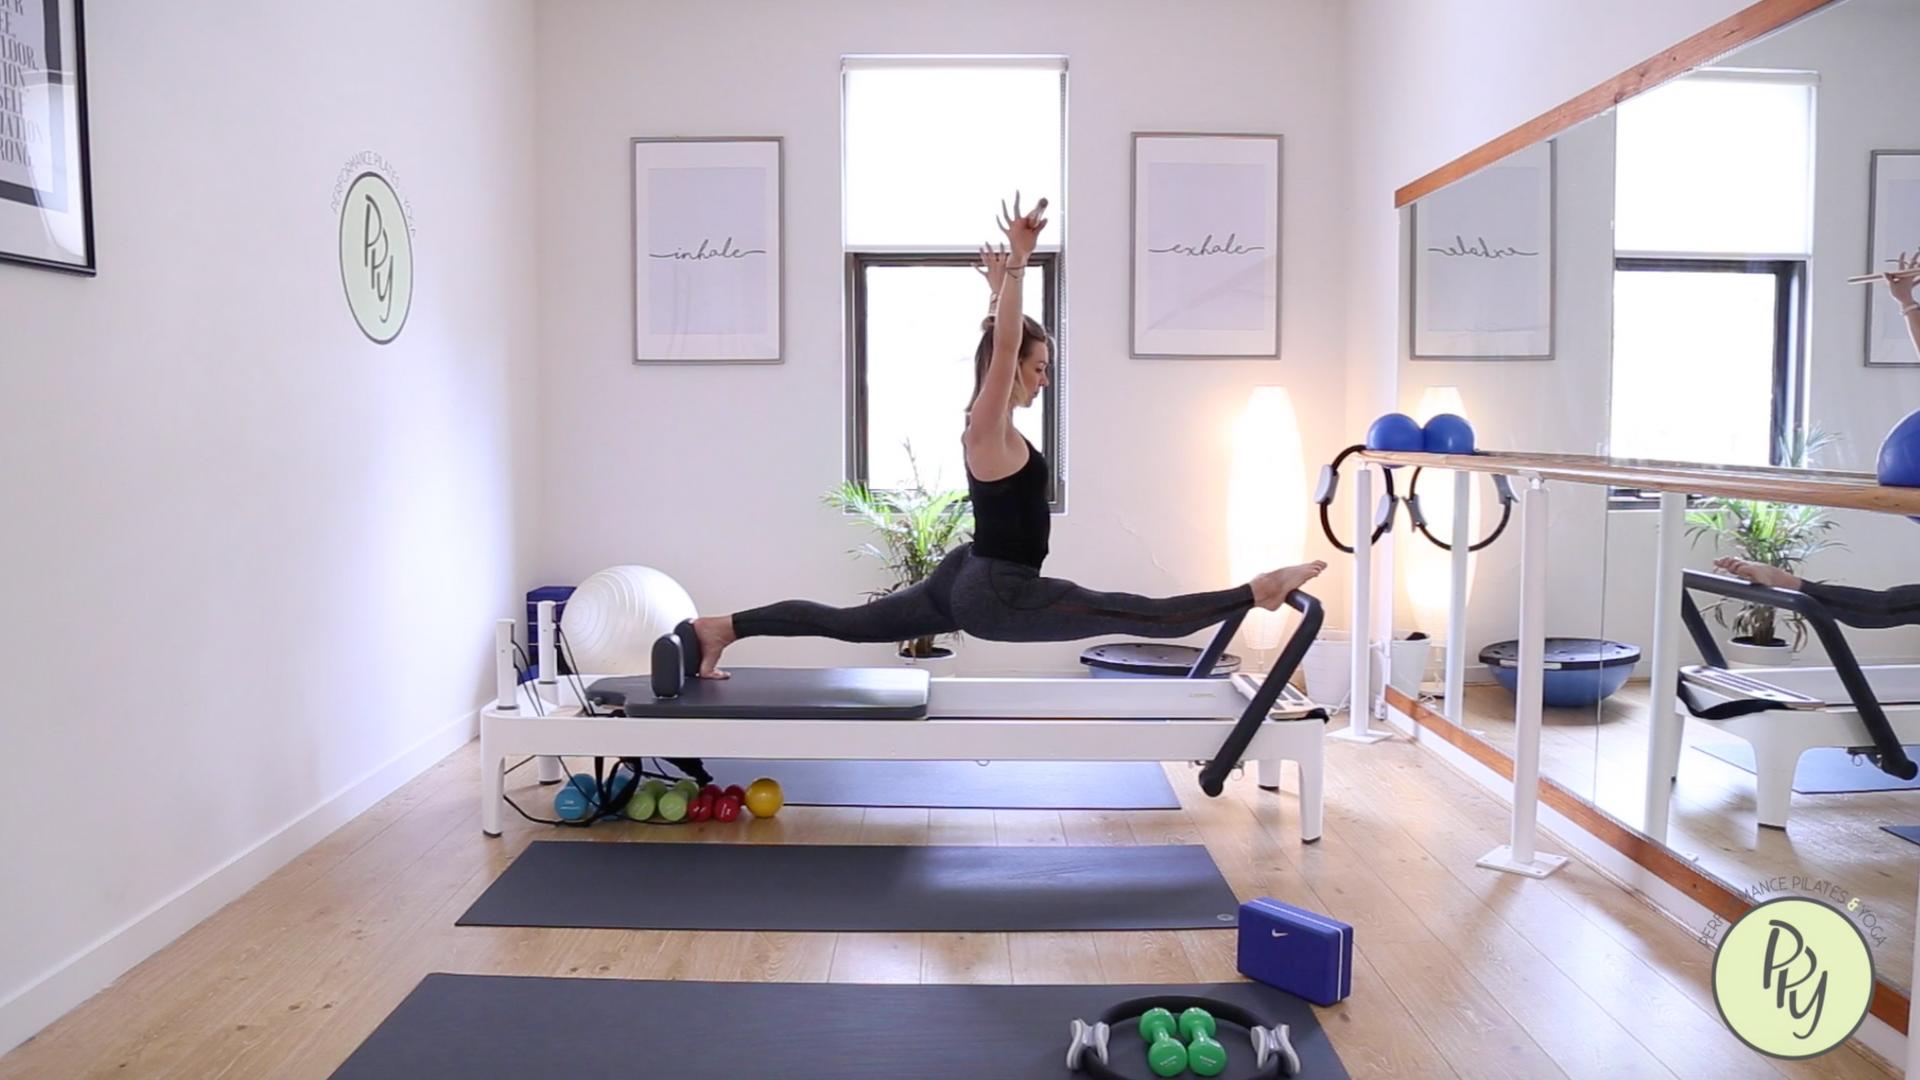 Performance Pilates & Yoga